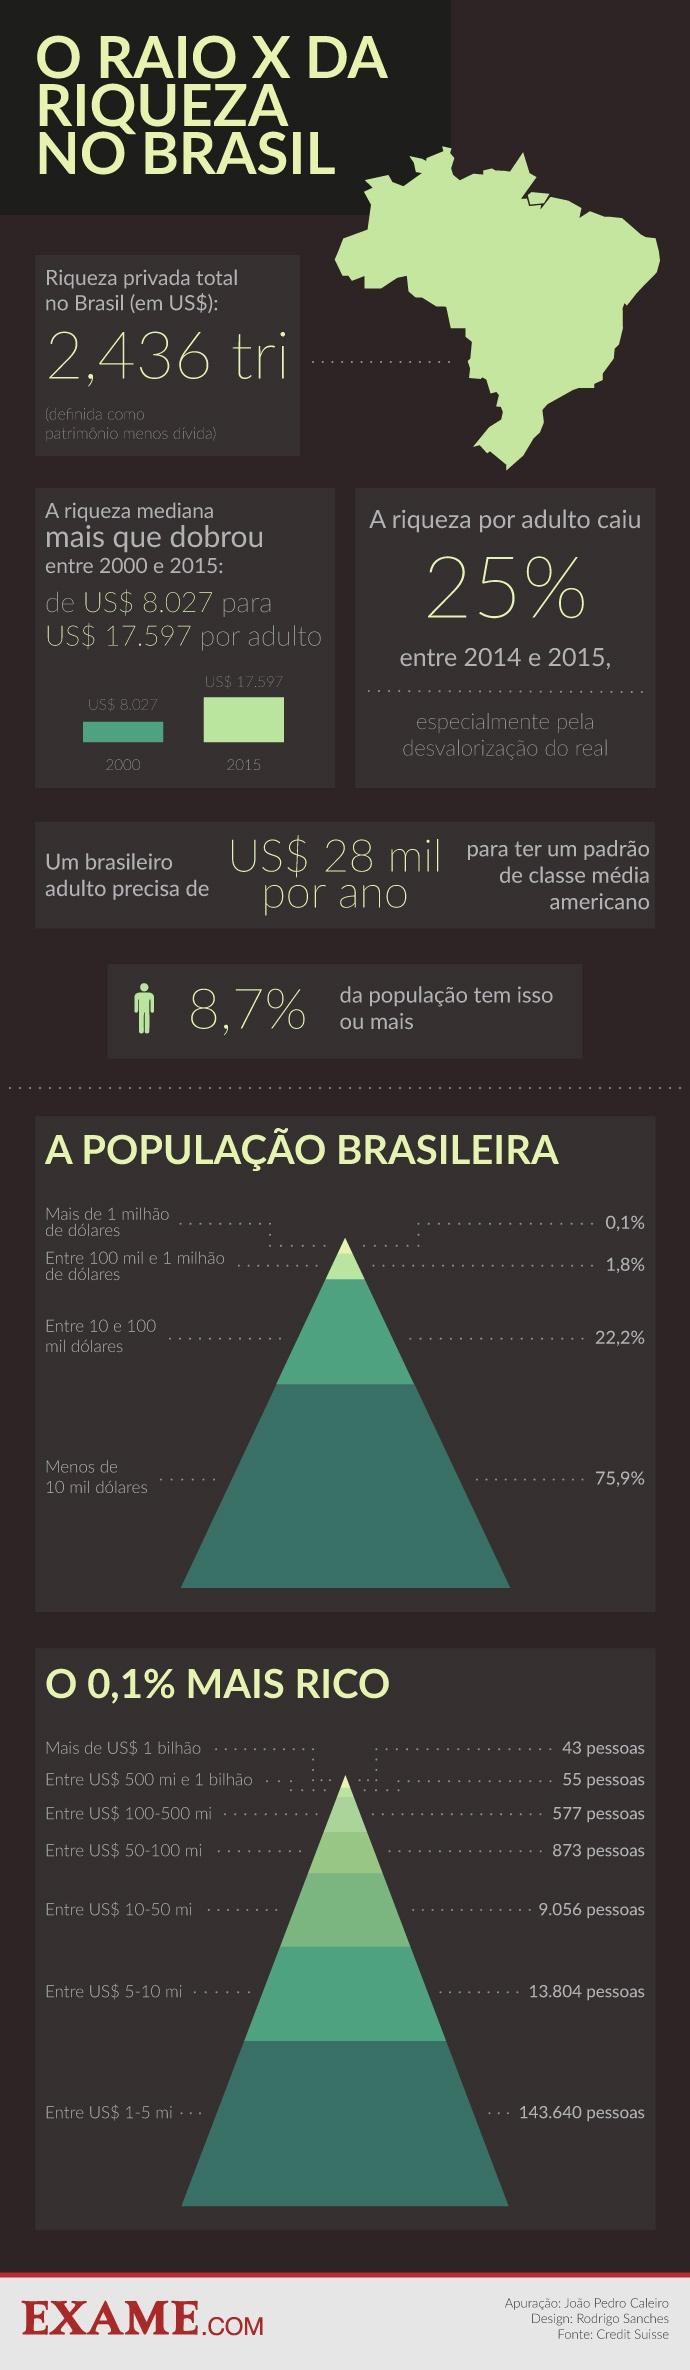 riqueza no brasil